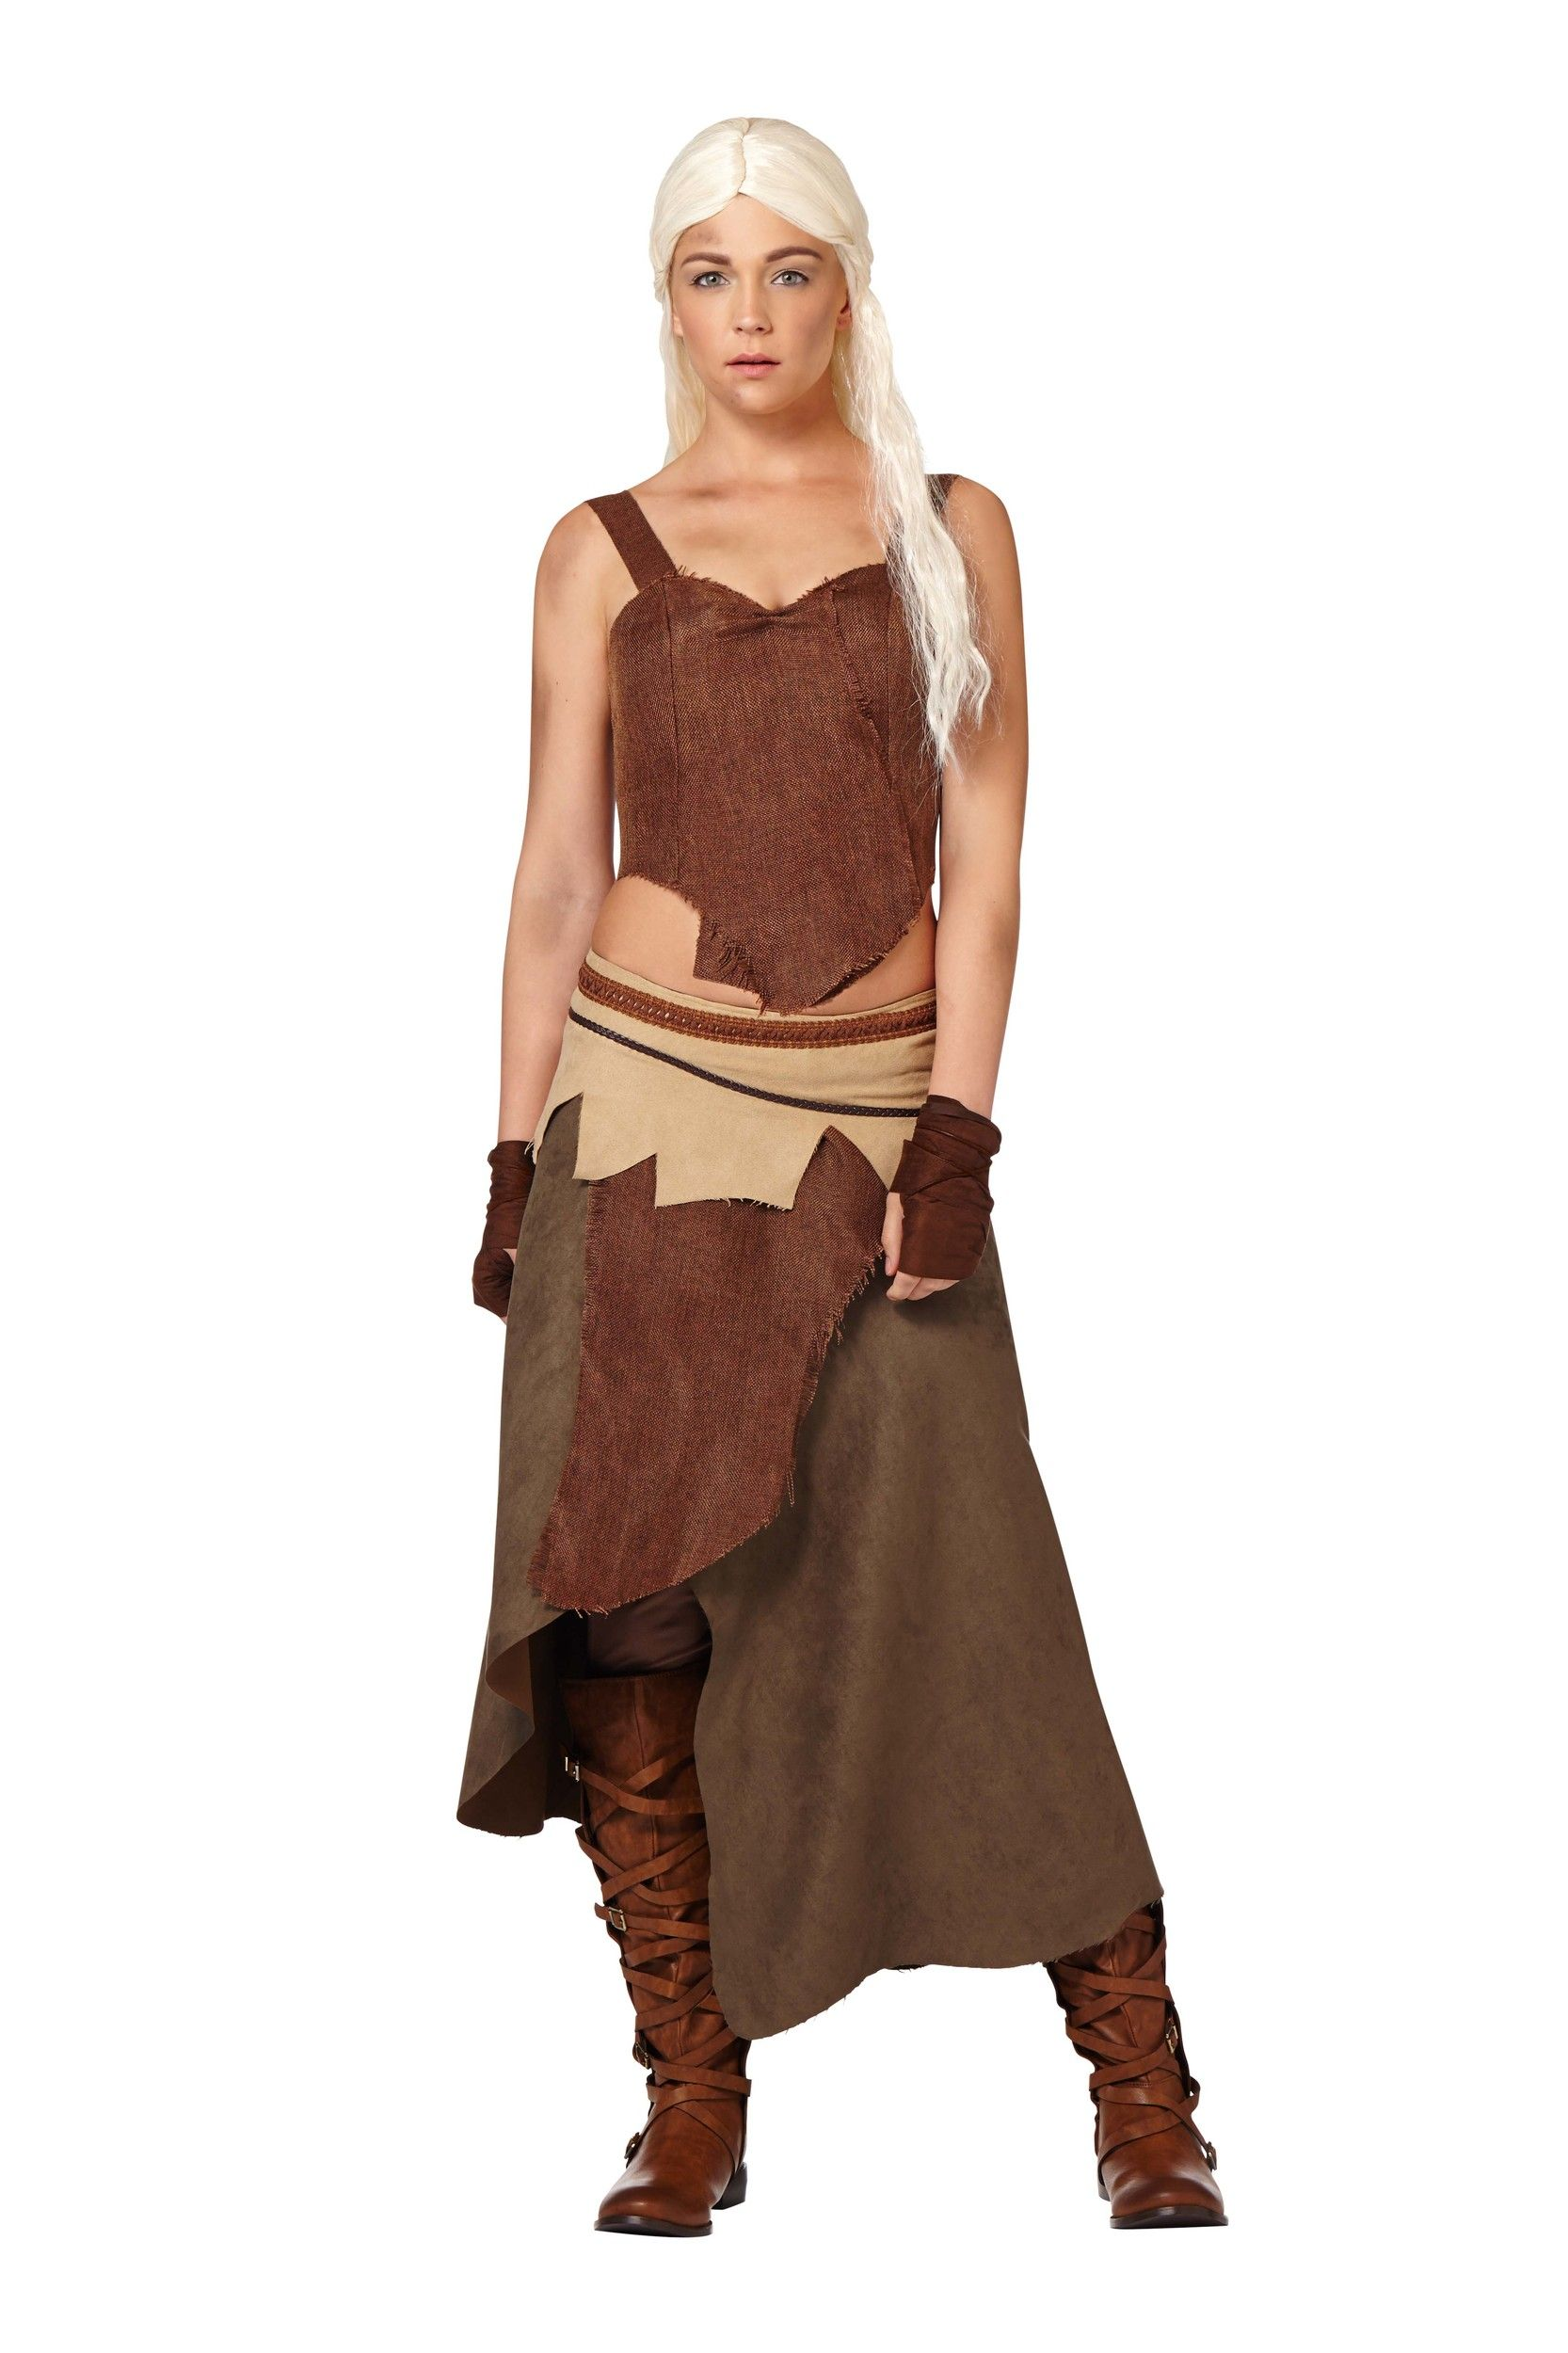 'Game of Thrones' costumes Daenerys Targaryen Dothraki Image Credit: Spirit Halloween  via @AOL_Lifestyle Read more: http://www.aol.com/article/2014/12/19/an-easy-and-delicious-recipe-for-homemade-eggnog-chai-lattes/21119191/?a_dgi=aolshare_pinterest#fullscreen